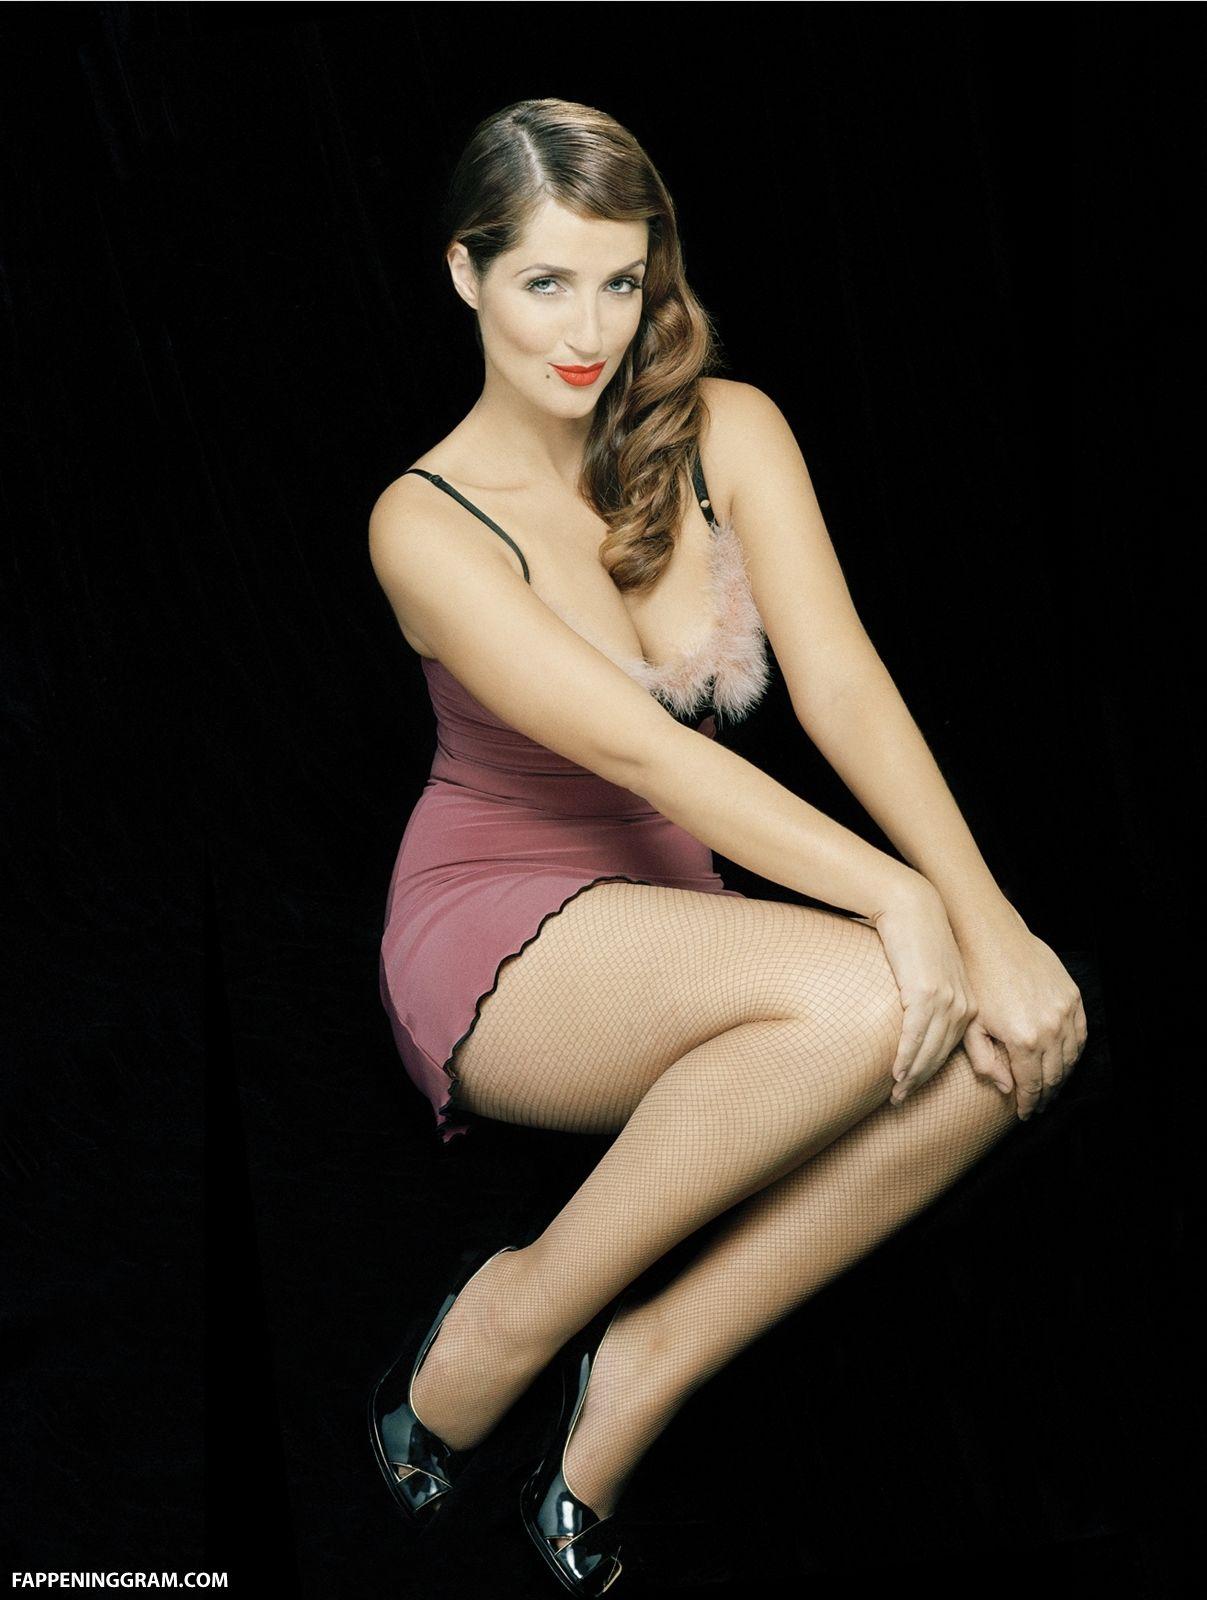 Bianca Dye Nude The Fappening - FappeningGram